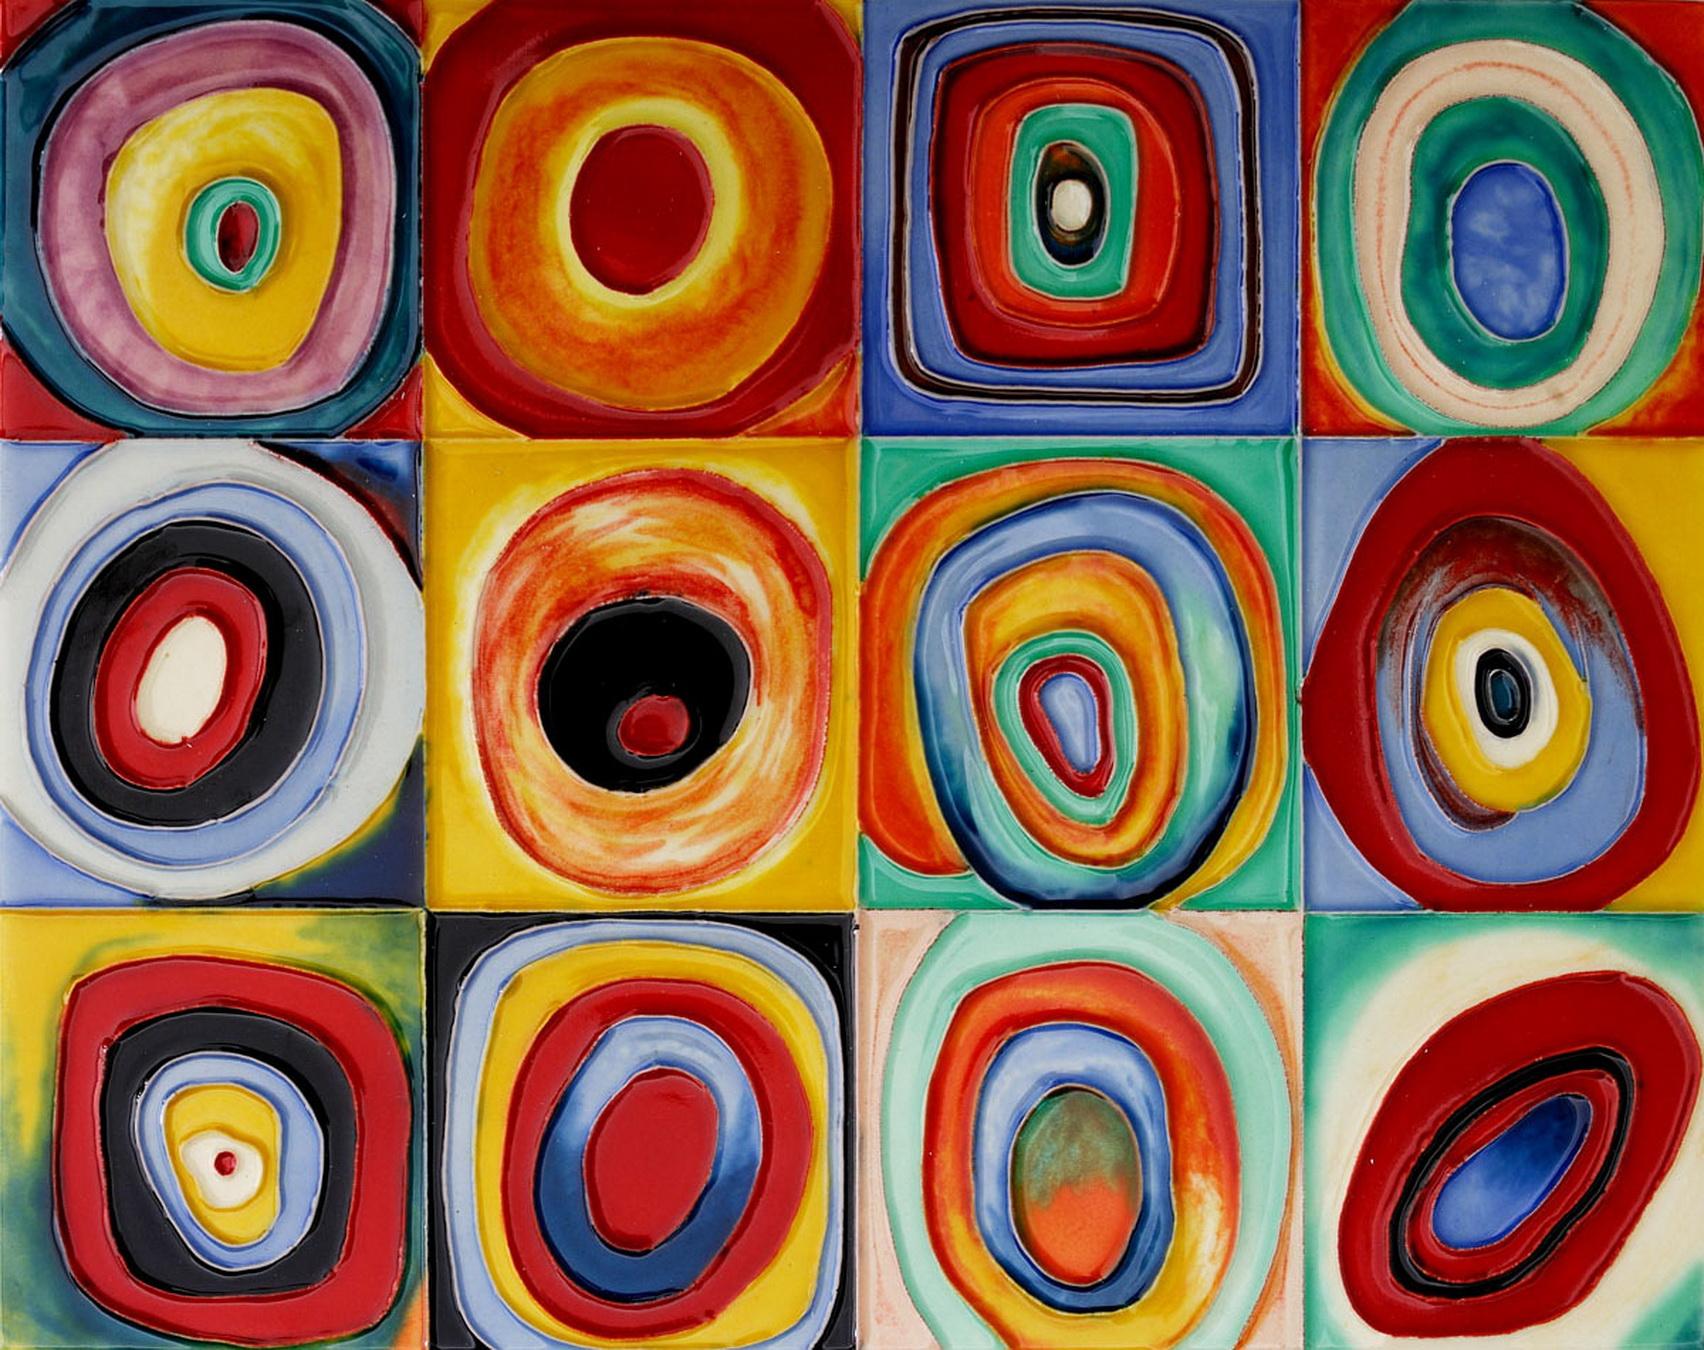 Overstockart Introduces New Artwork To Decorative Ceramic Tile